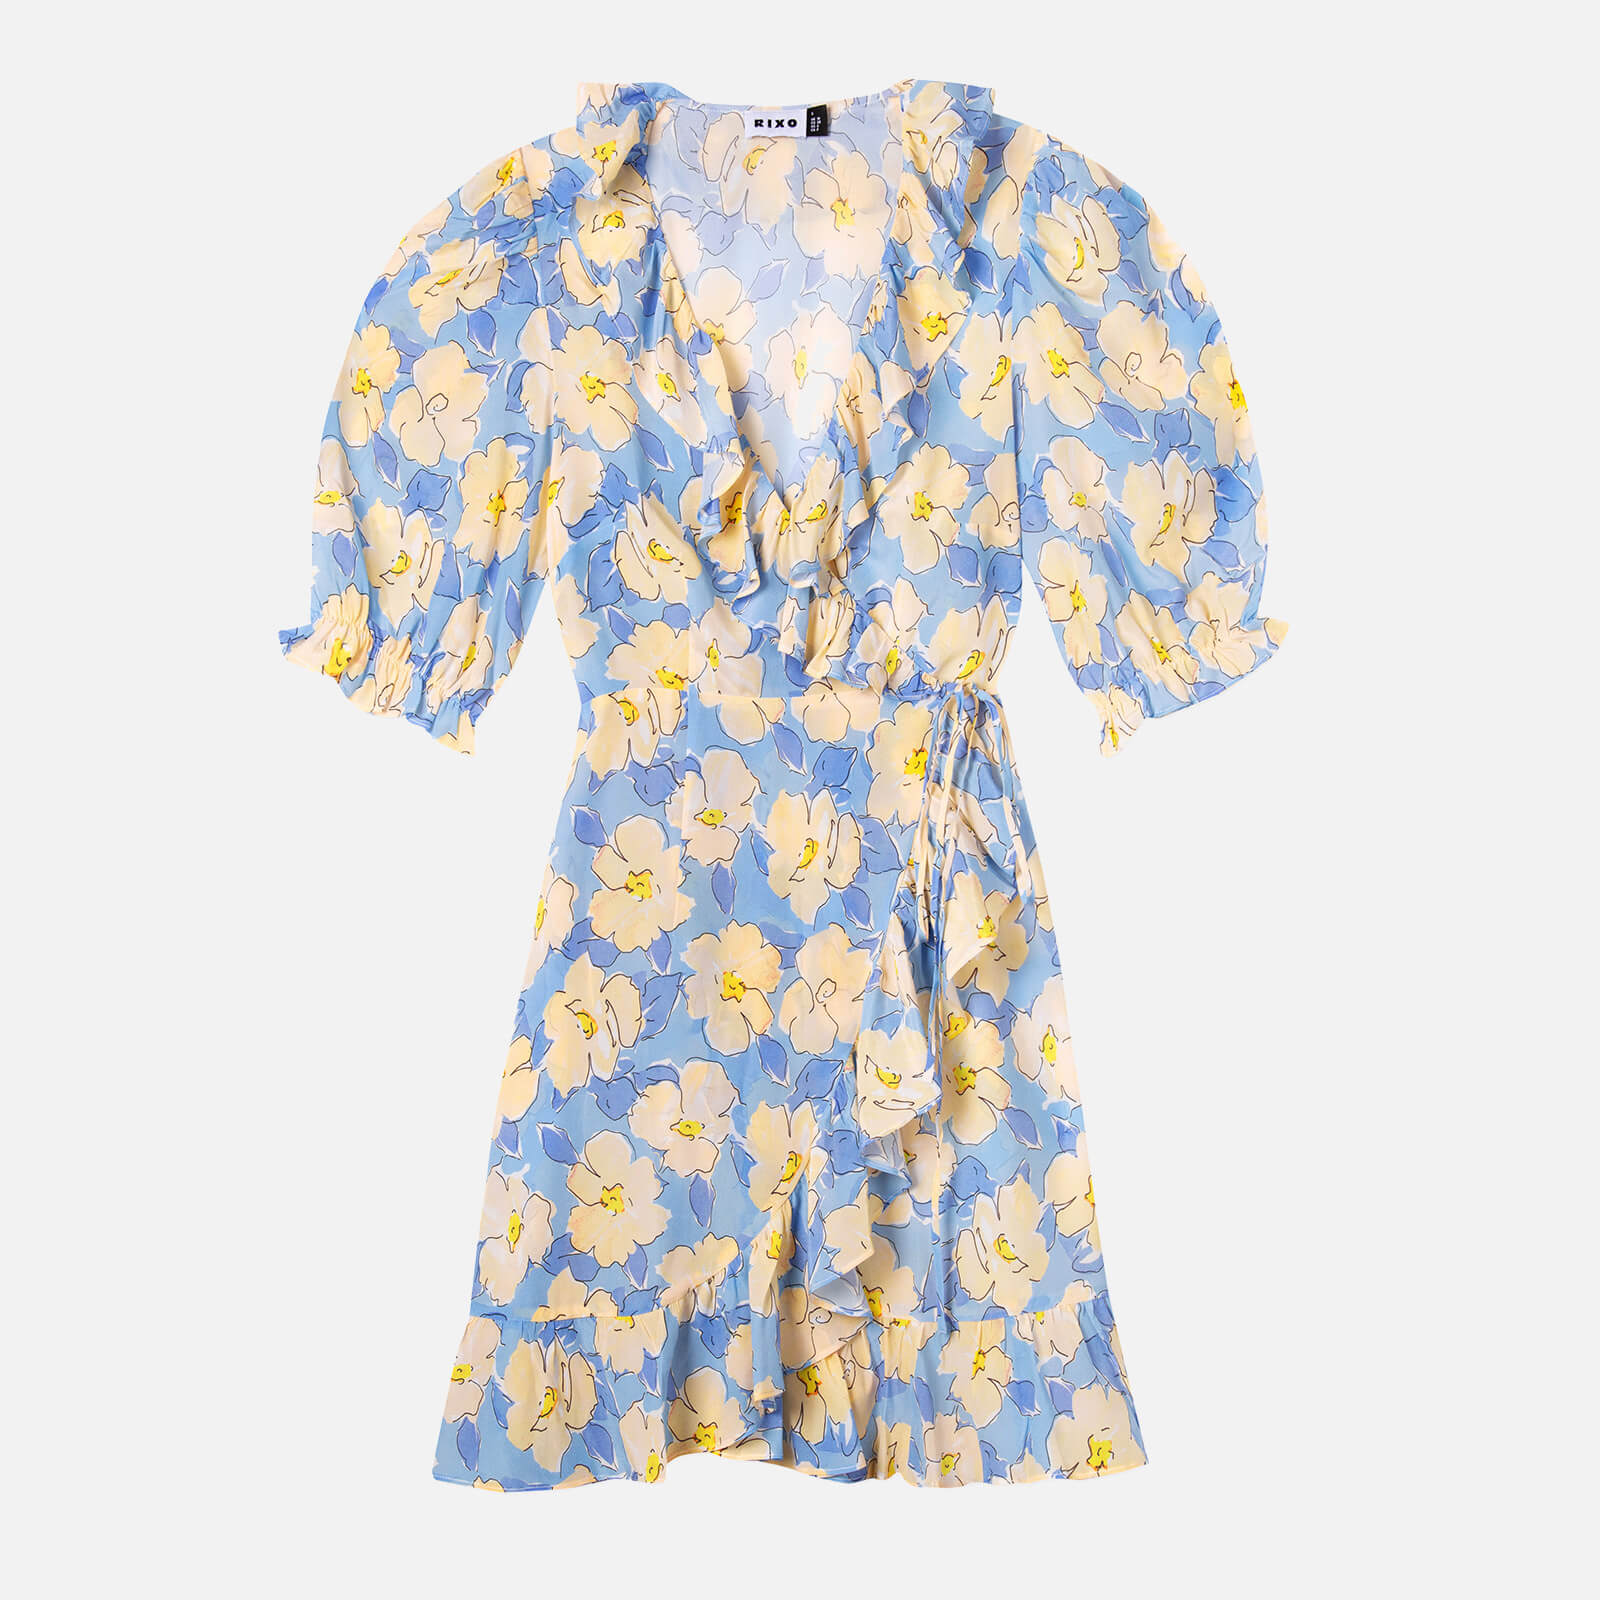 RIXO Women's Nina Dress - Azela Bloom - Lilac Yellow - XS